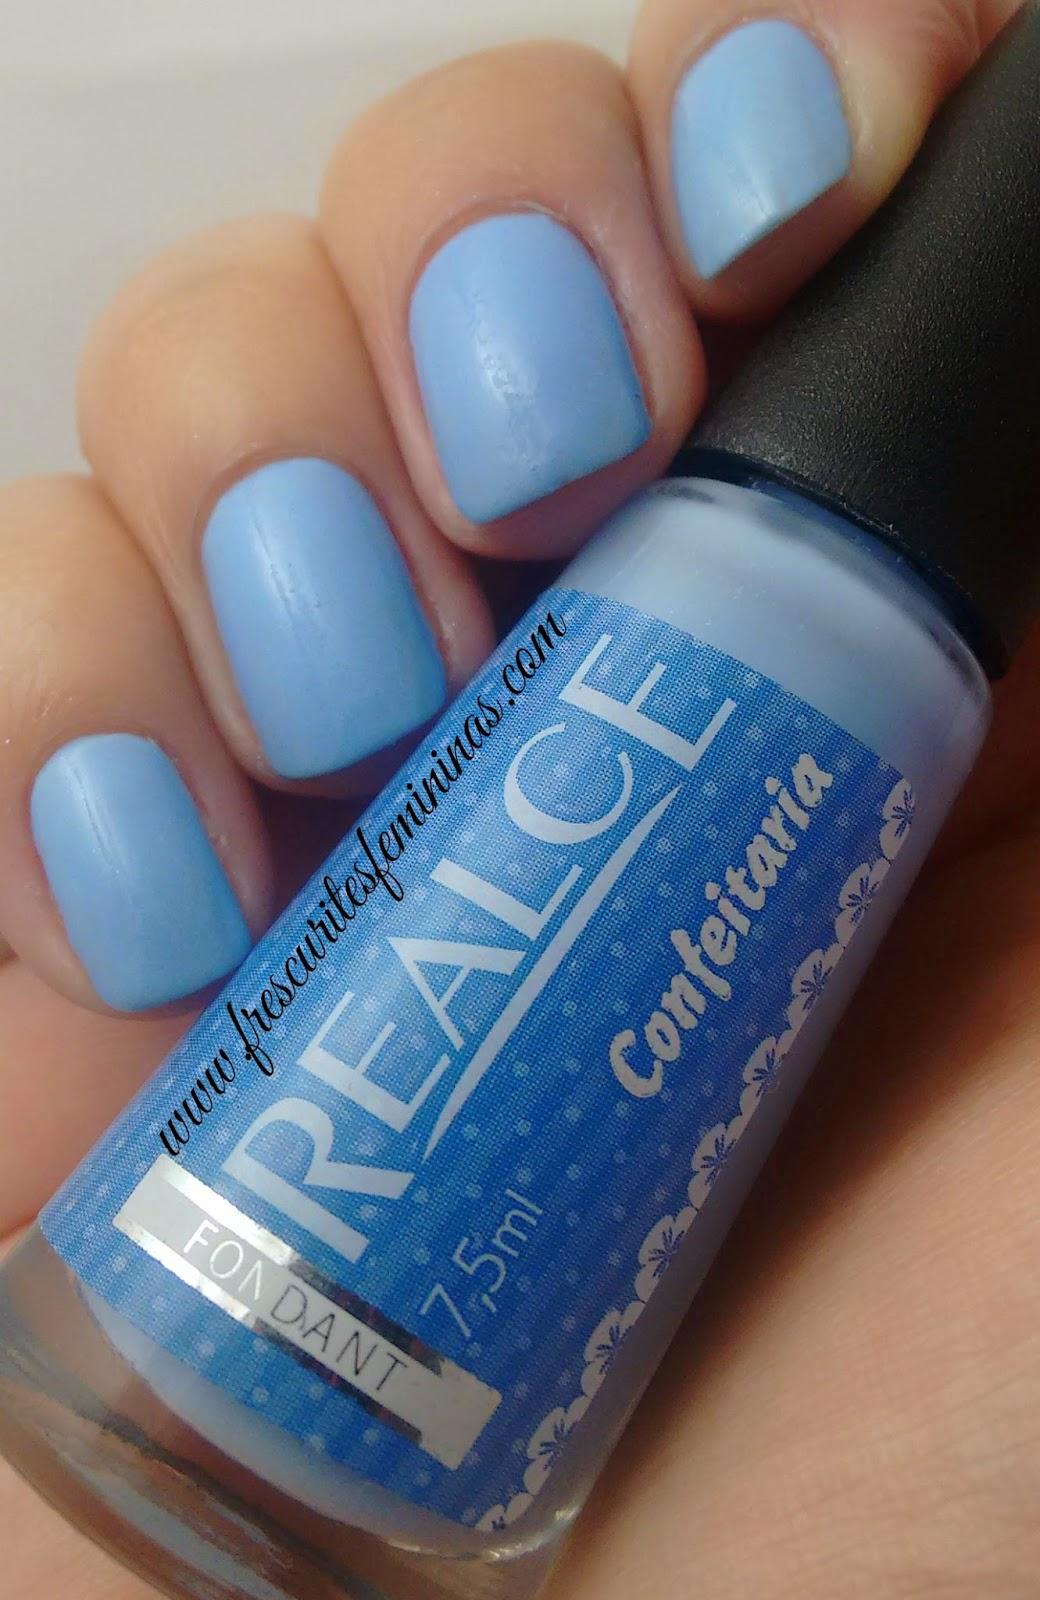 Esmalte, Realce, Fondant, Frescurites, Femininas, blue nails